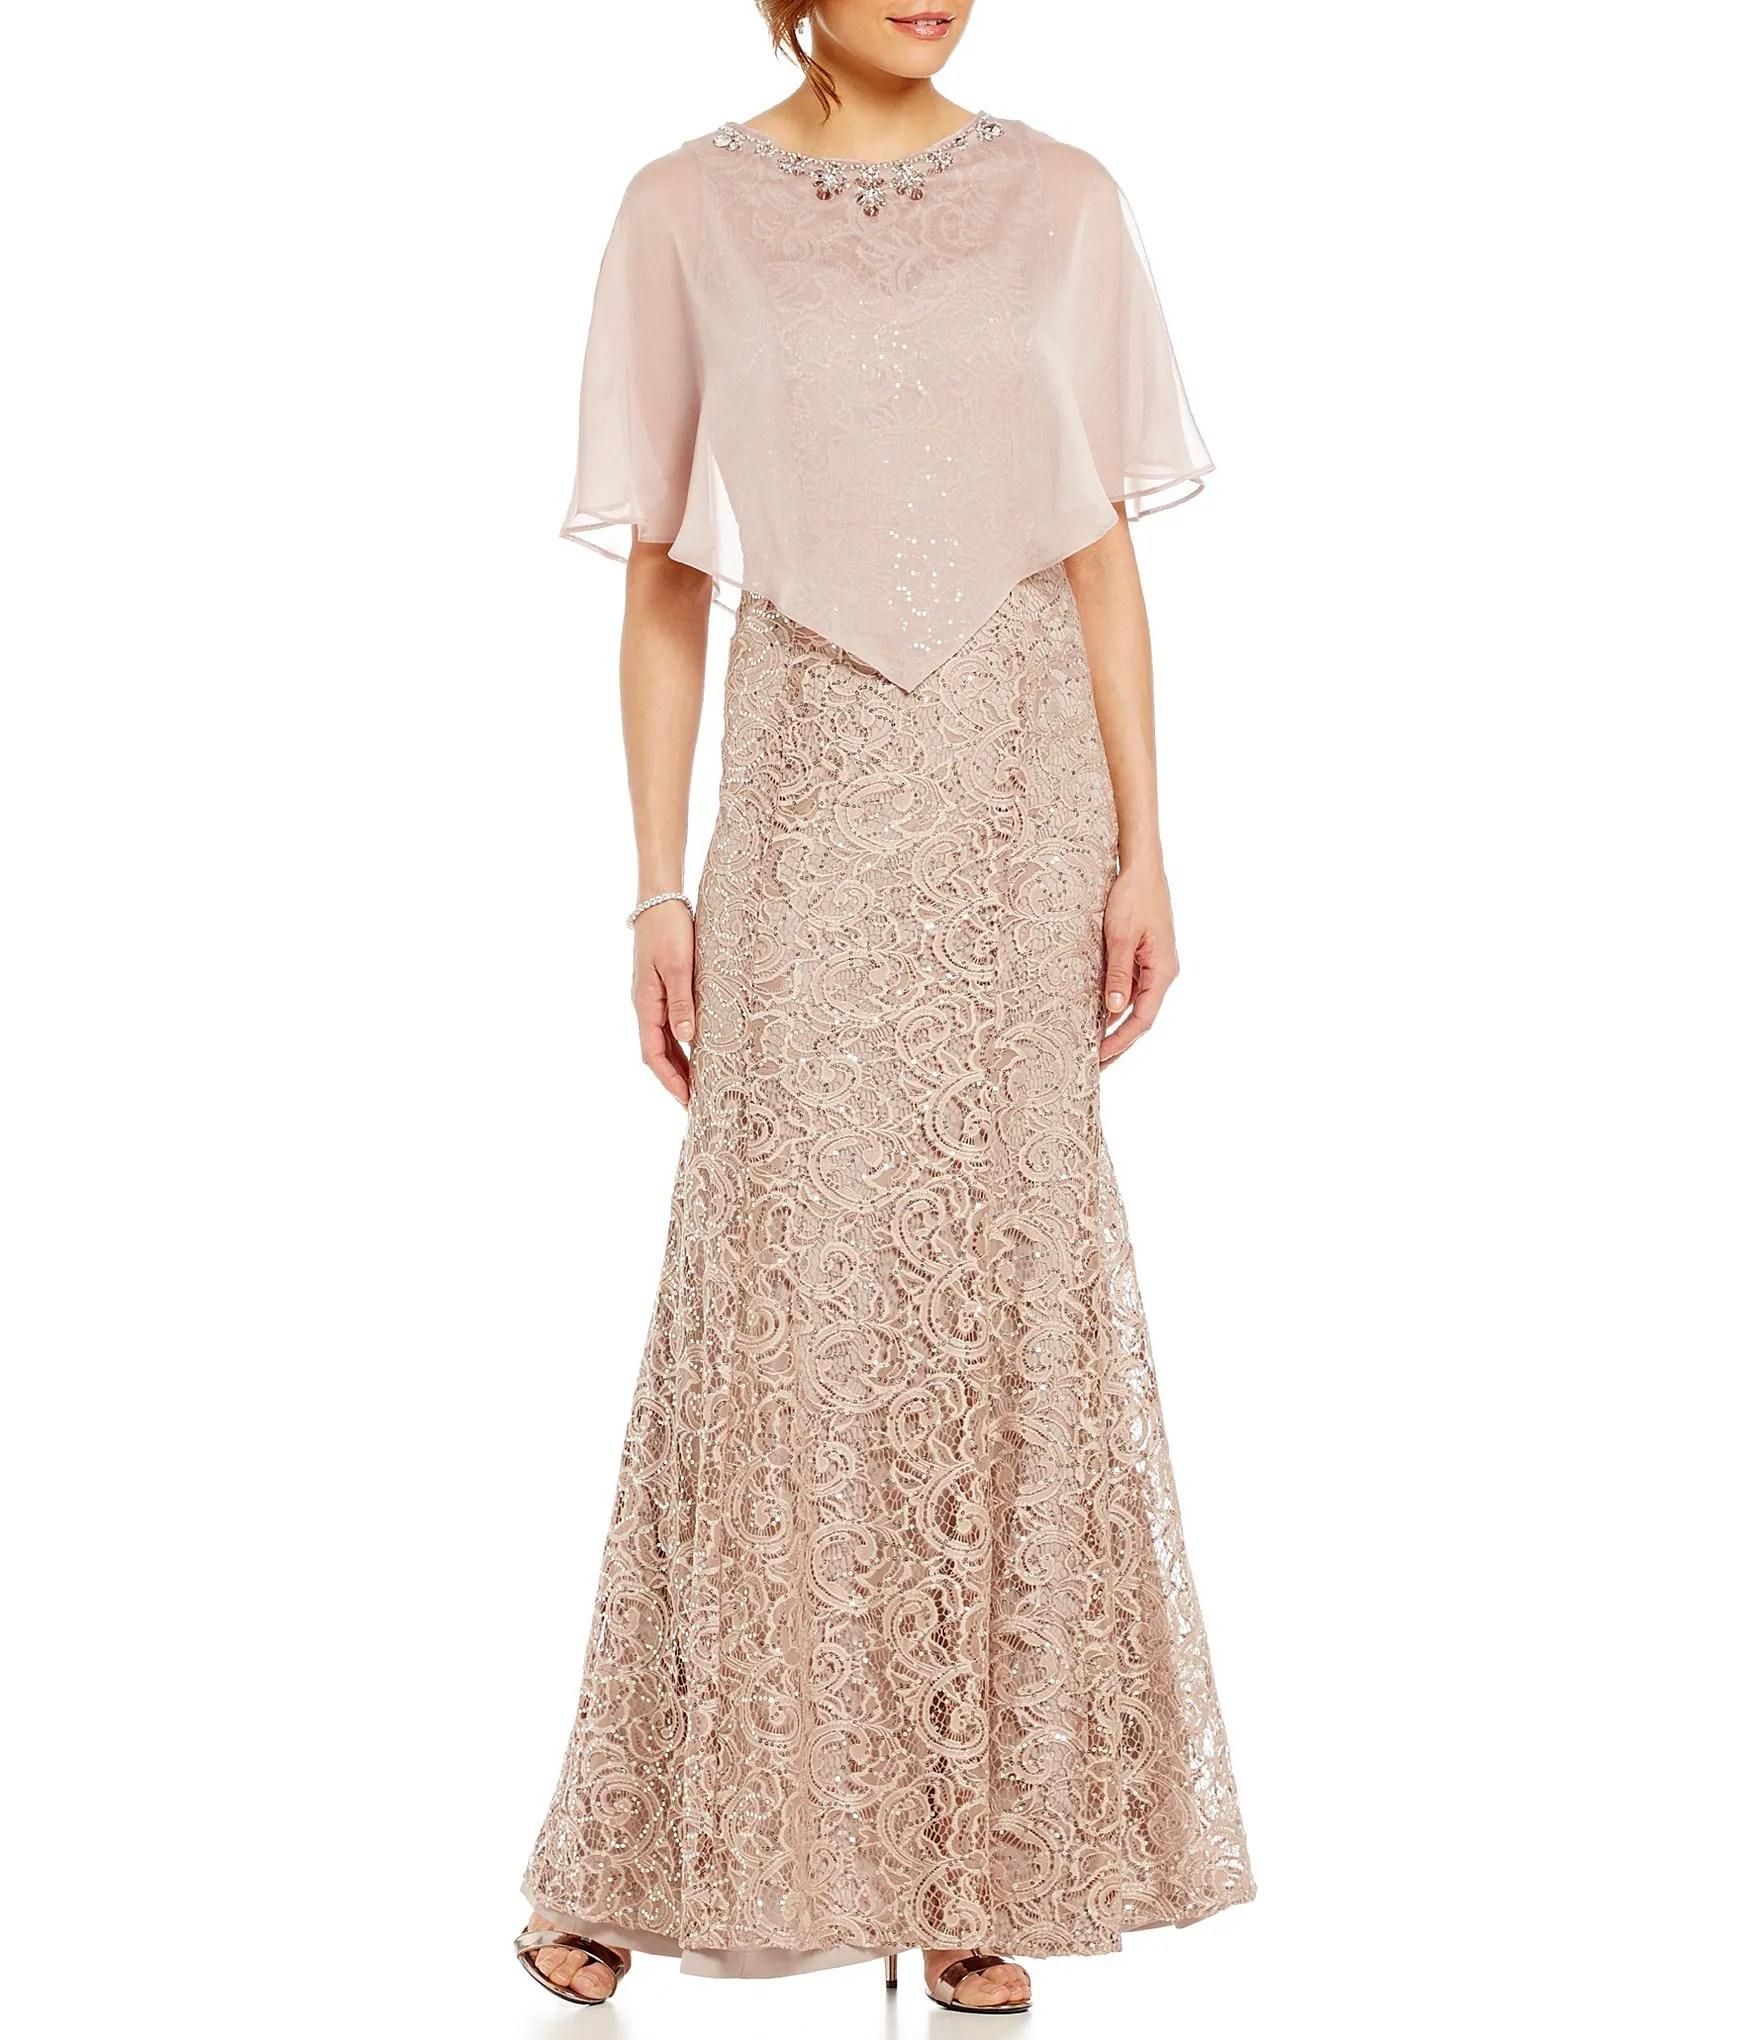 Dillards Evening Dresses